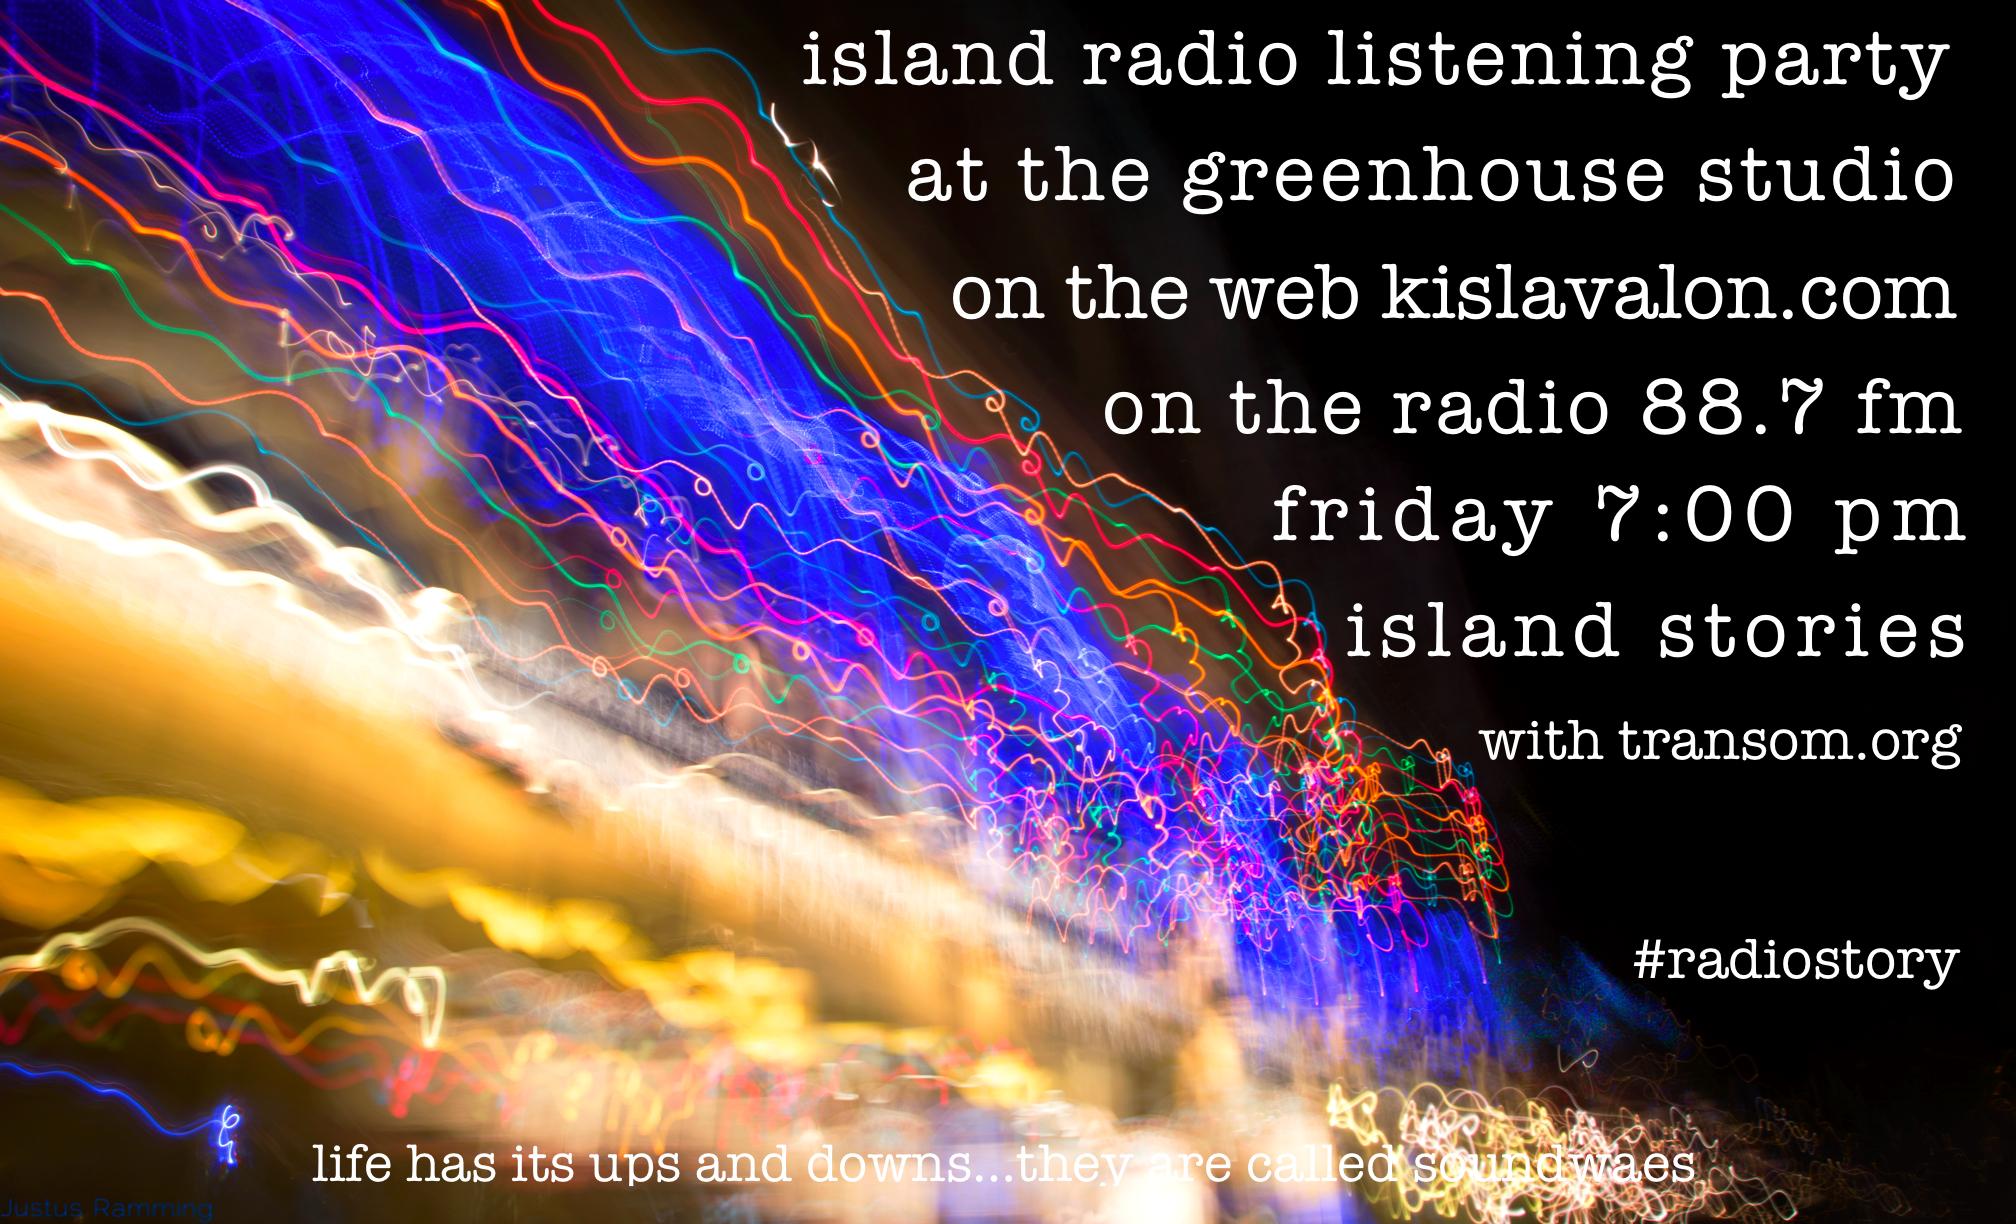 listening party 14 full bleed